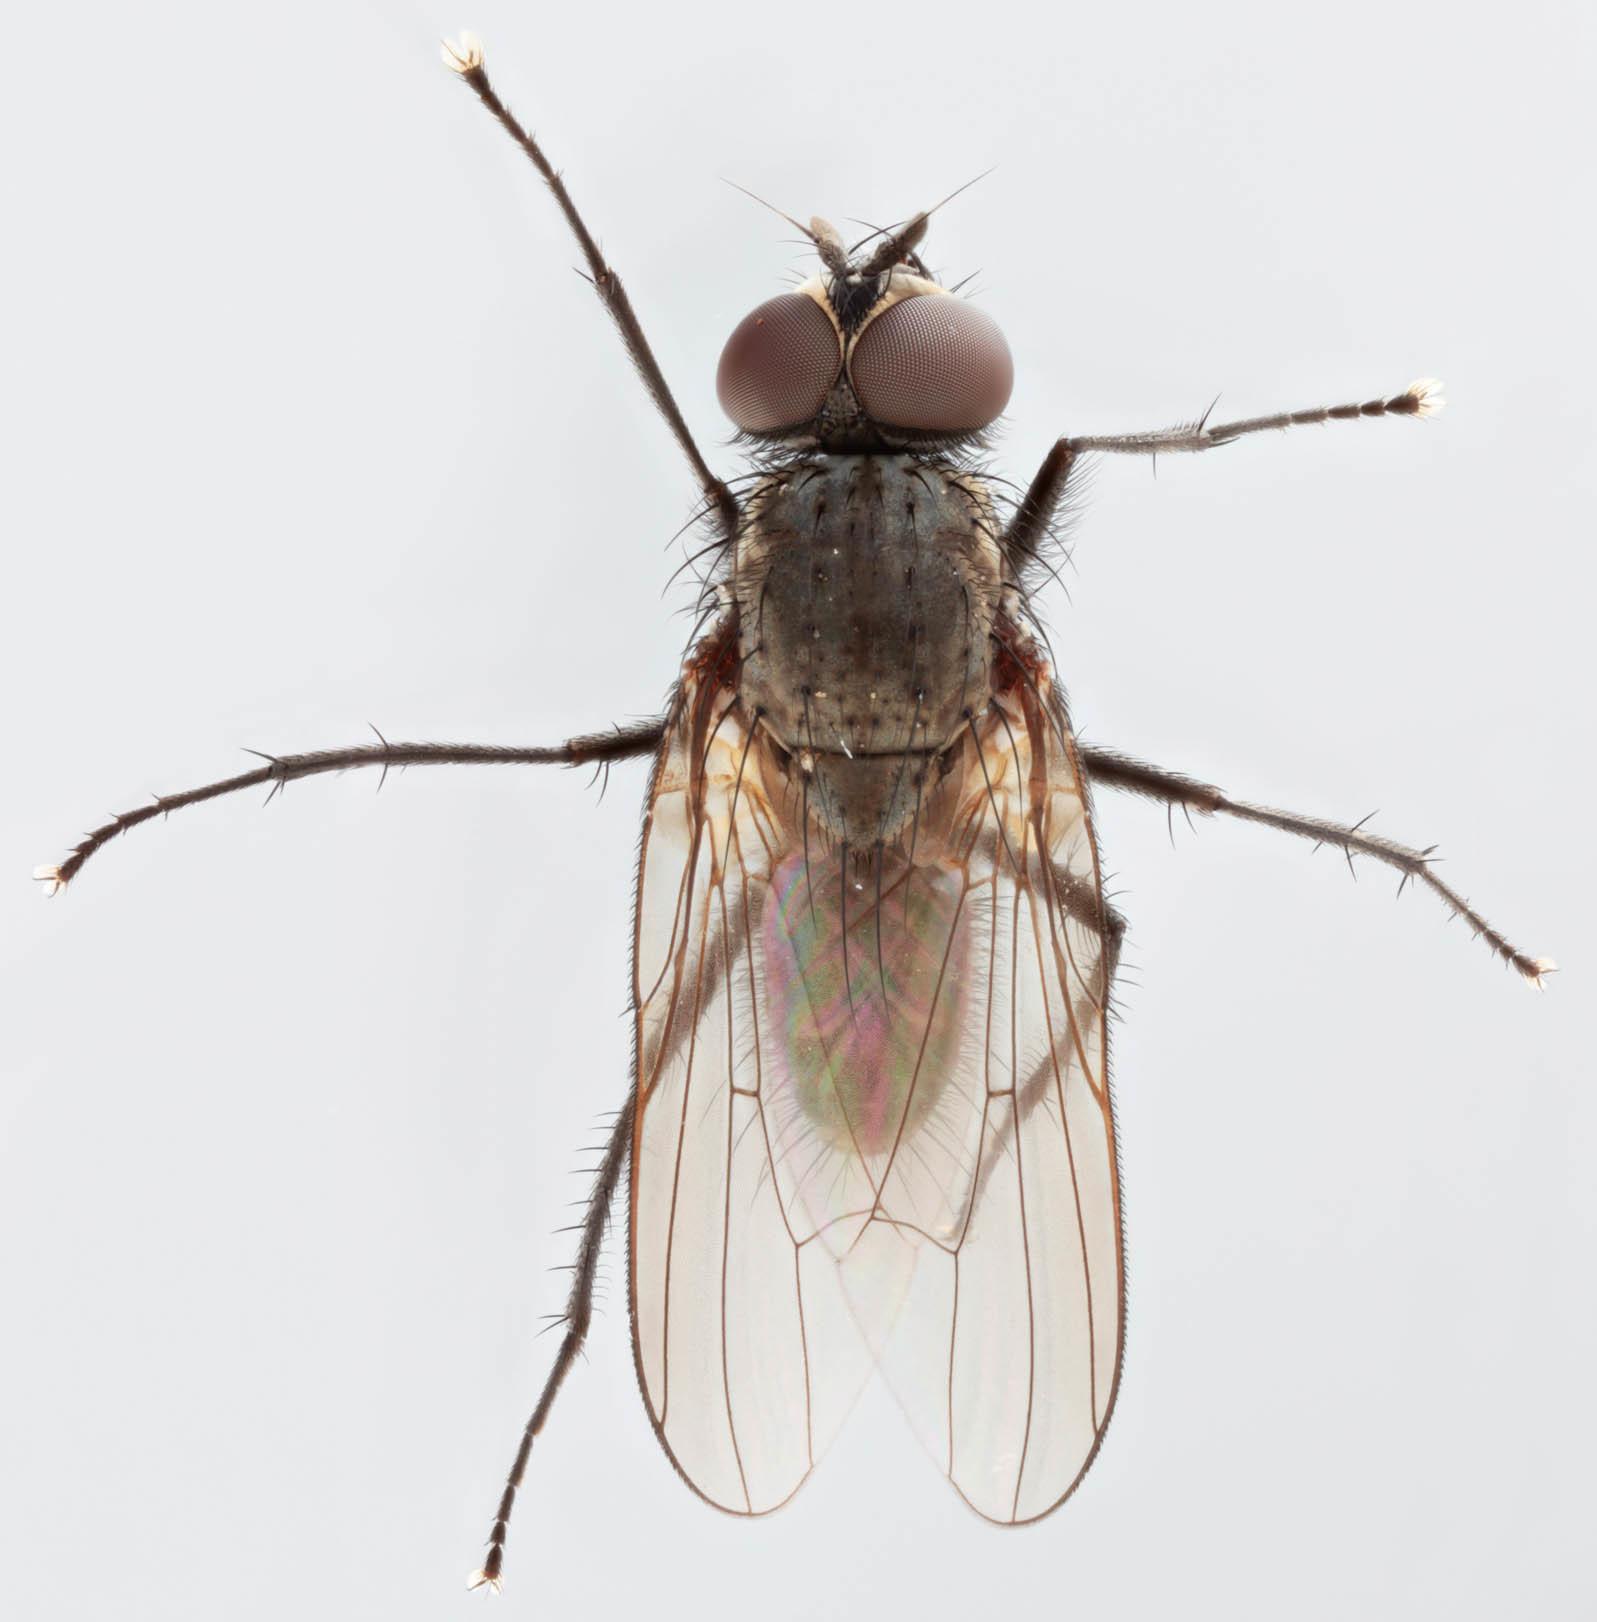 Image of Seedcorn maggot